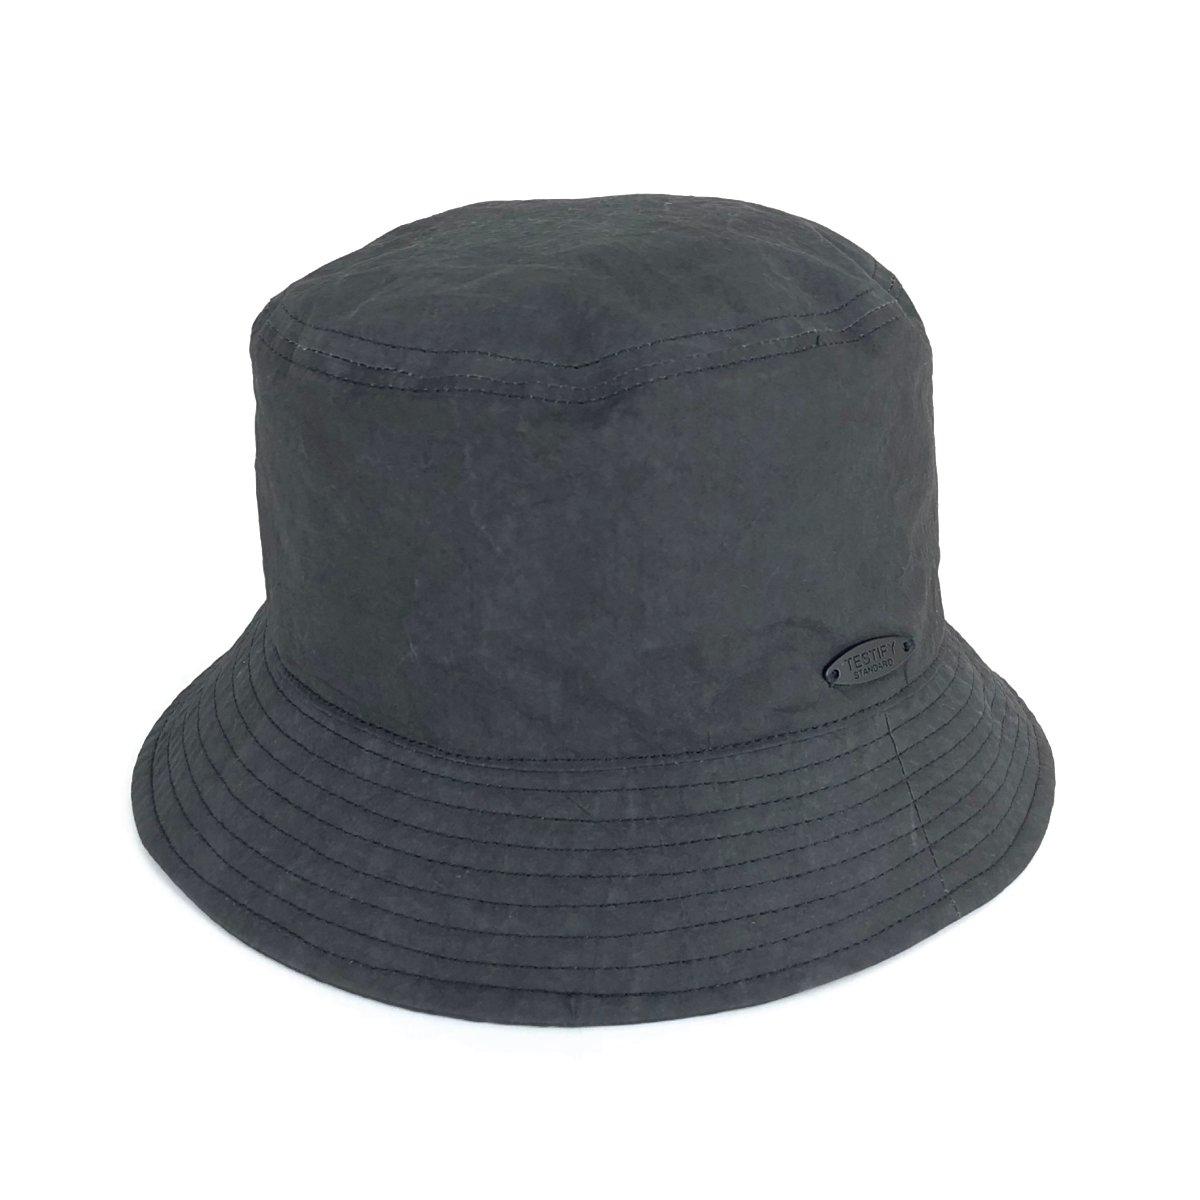 Dyeing Hat 詳細画像1